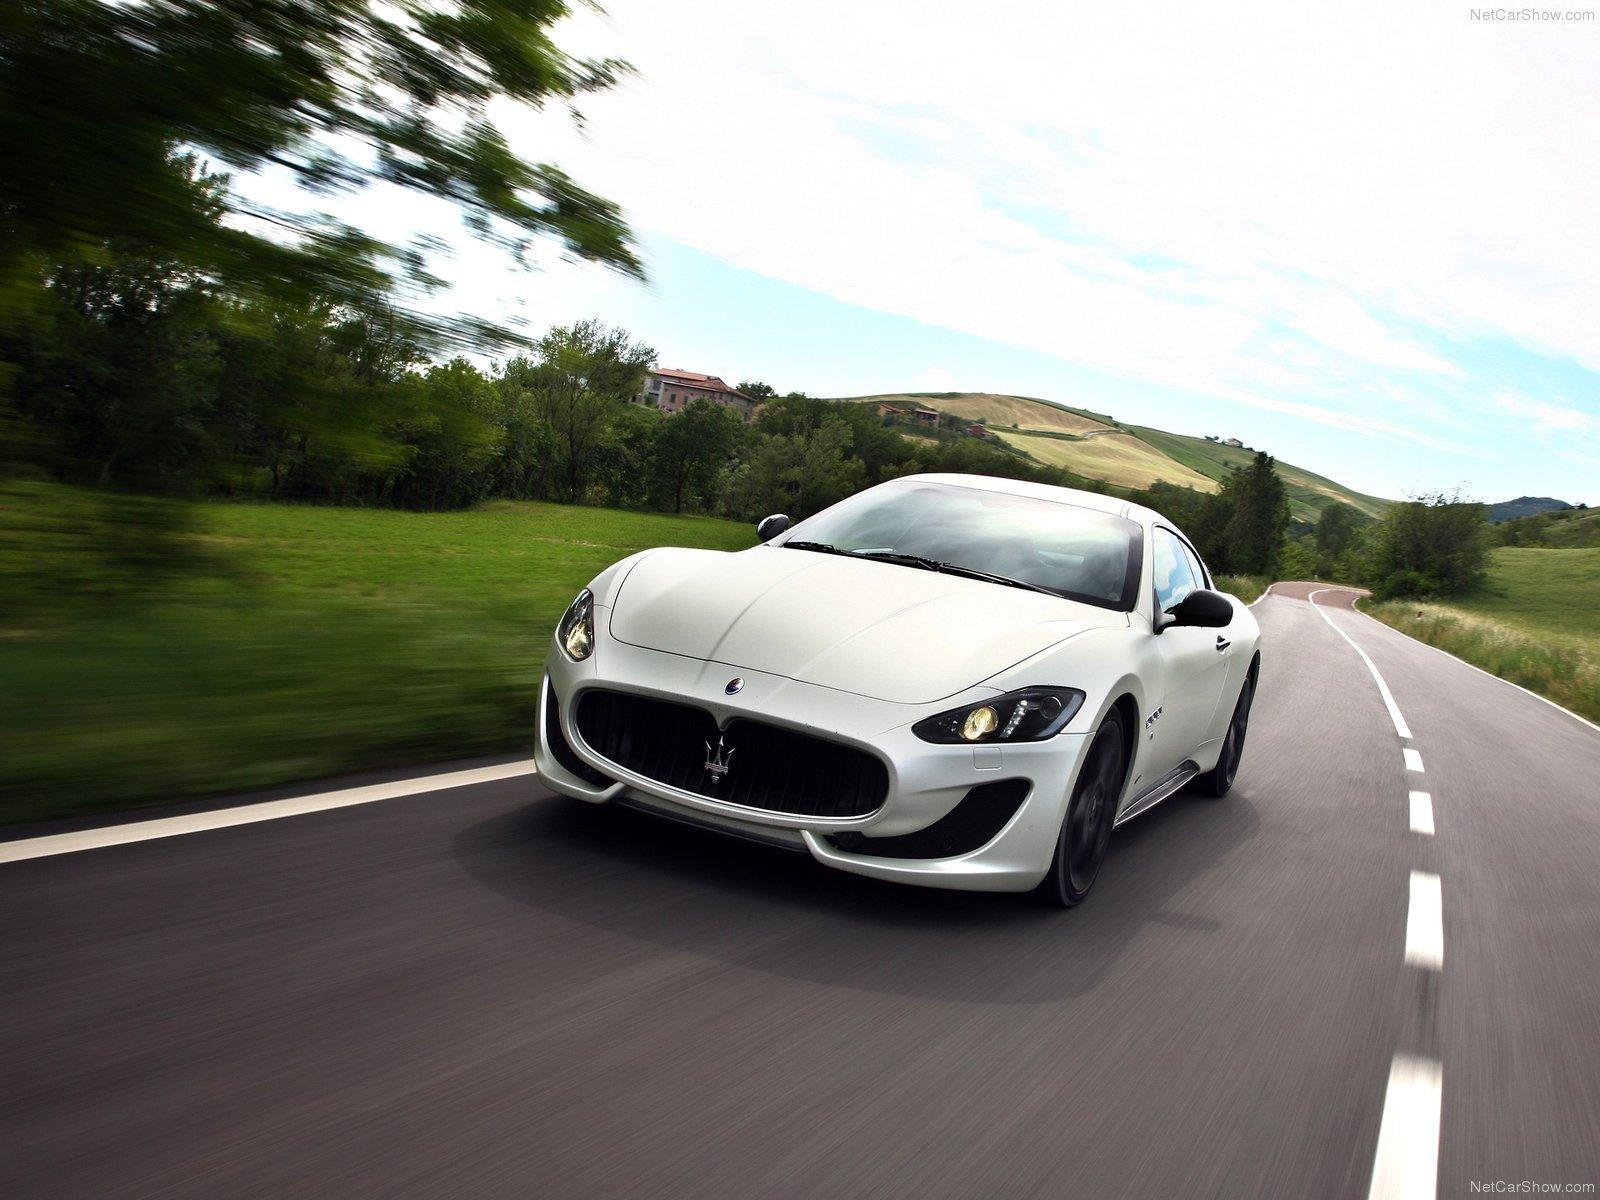 Hình ảnh siêu xe Maserati GranTurismo Sport 2013 & nội ngoại thất